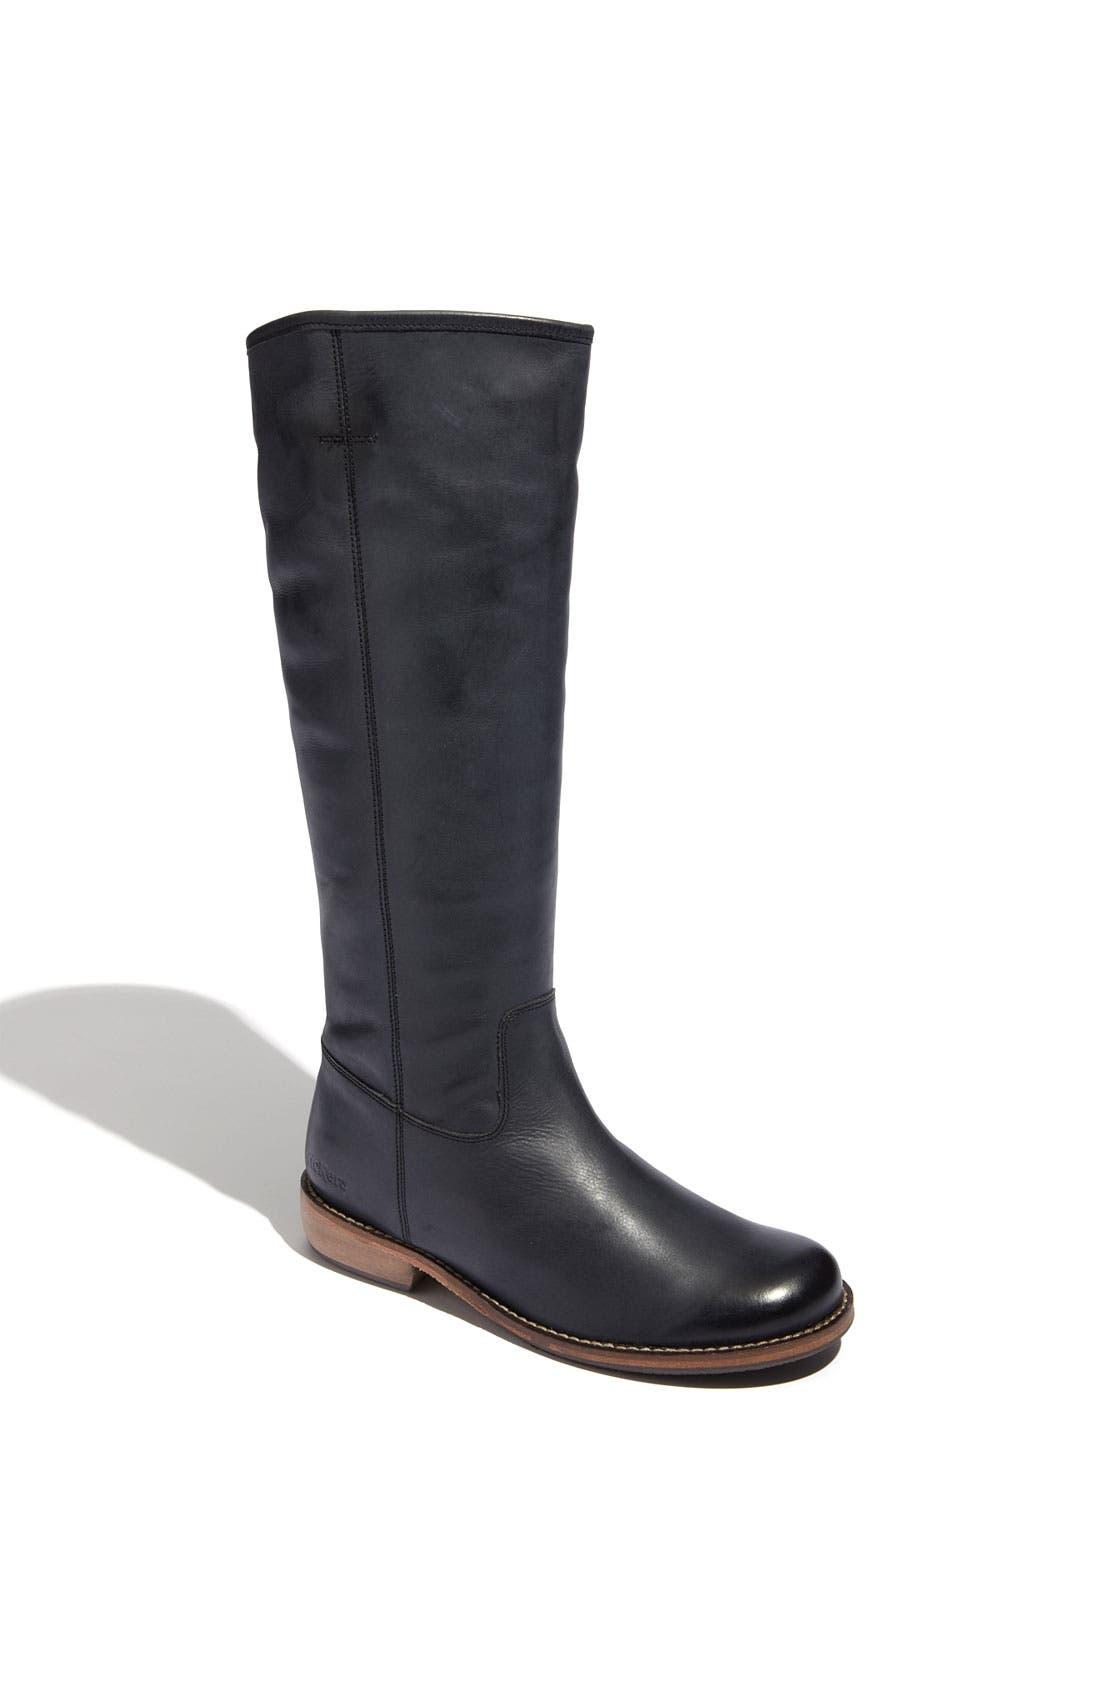 Alternate Image 1 Selected - Kickers 'Road' Boot